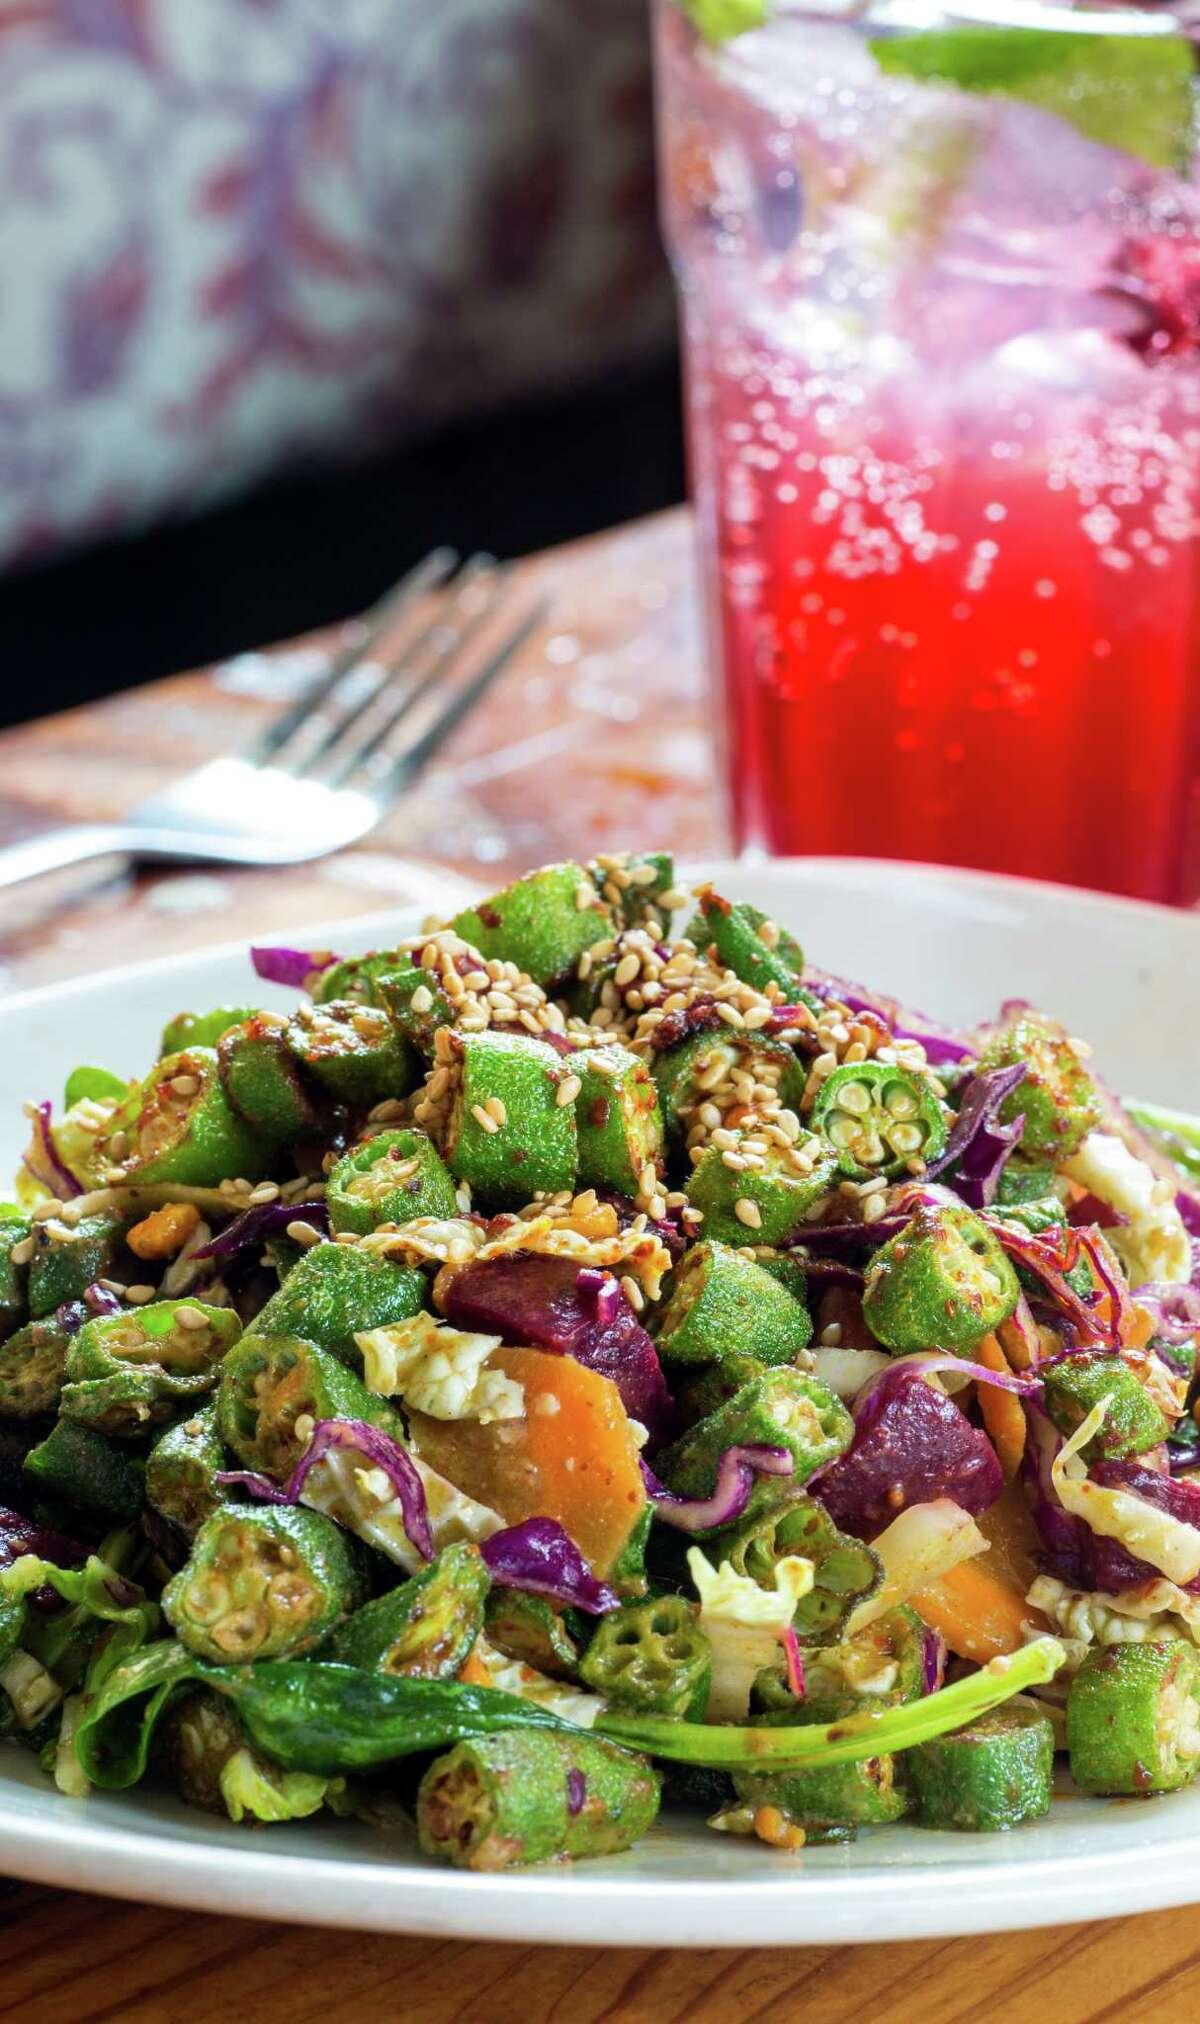 Okra salad at Pondicheri, Houston.